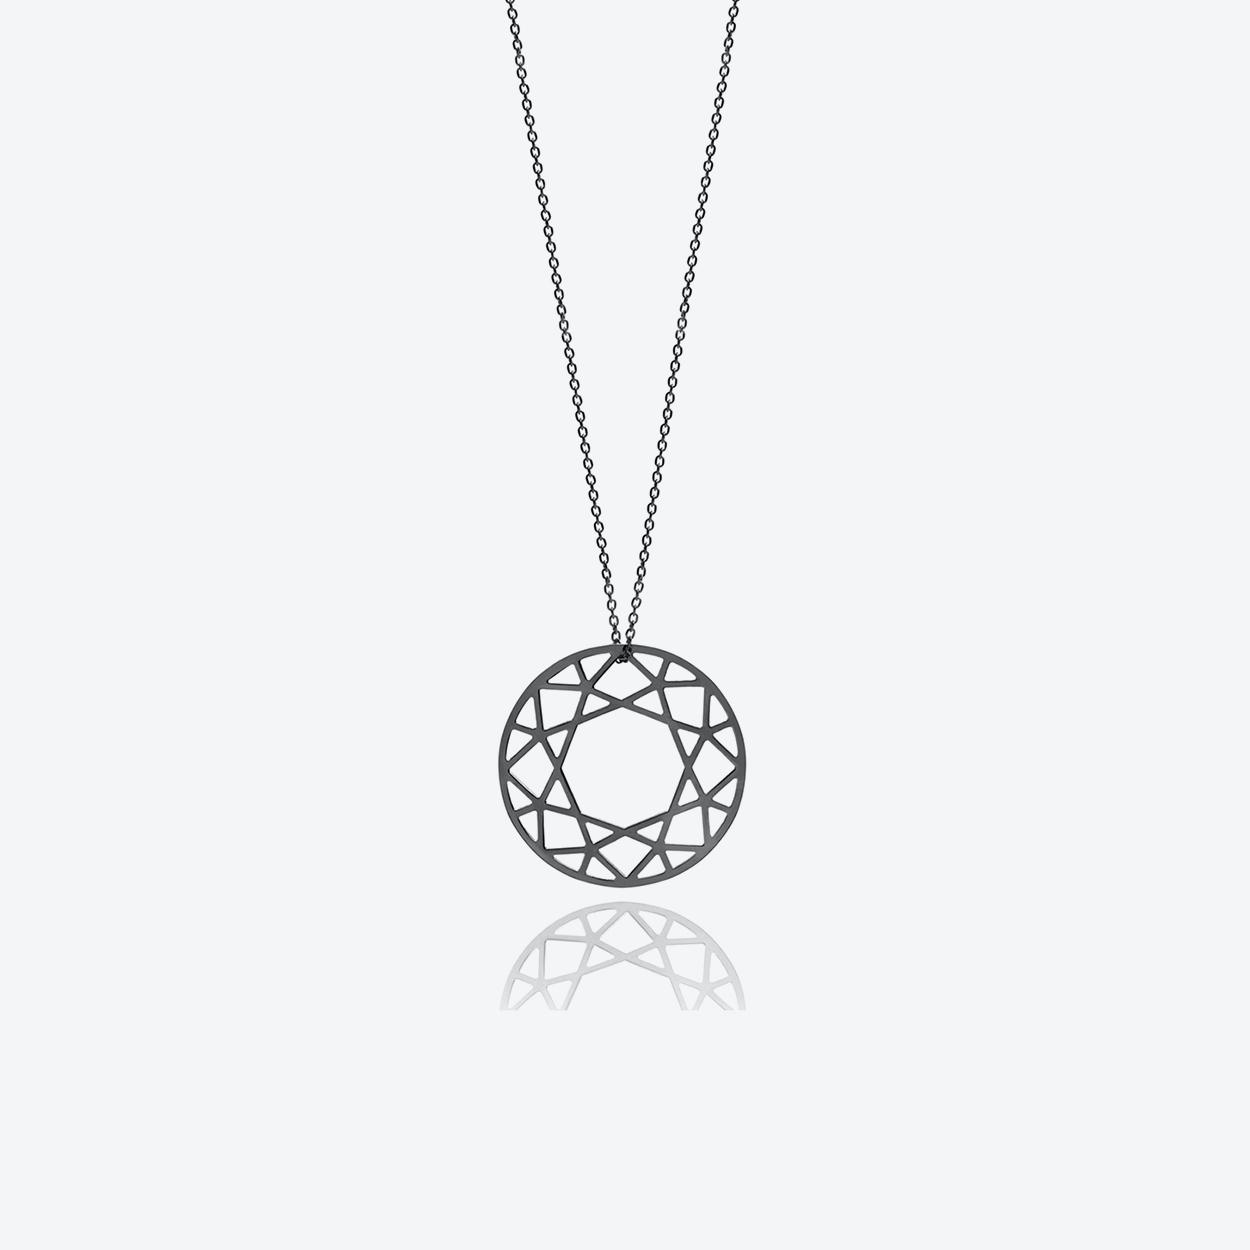 Large Brilliant Diamond Necklace in Black